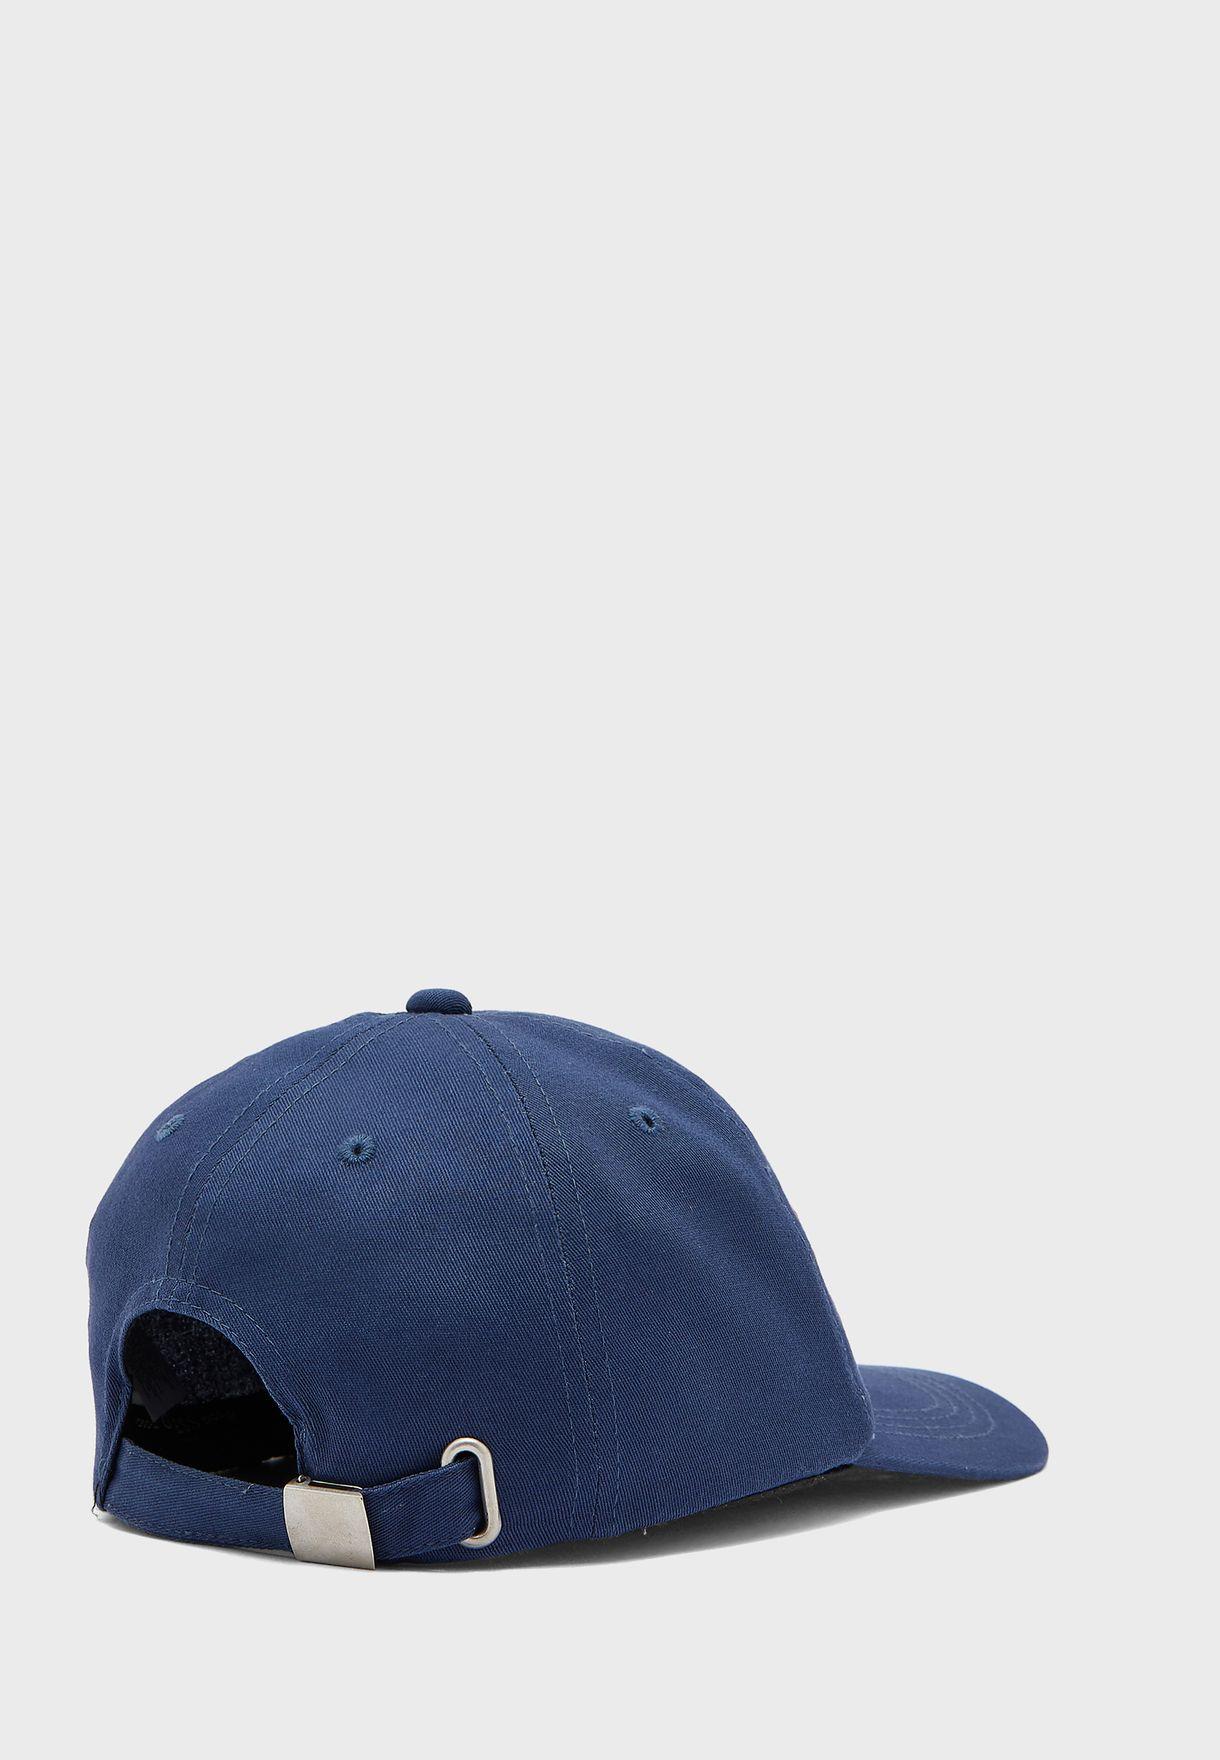 Kids Baseball Embroidered Cap